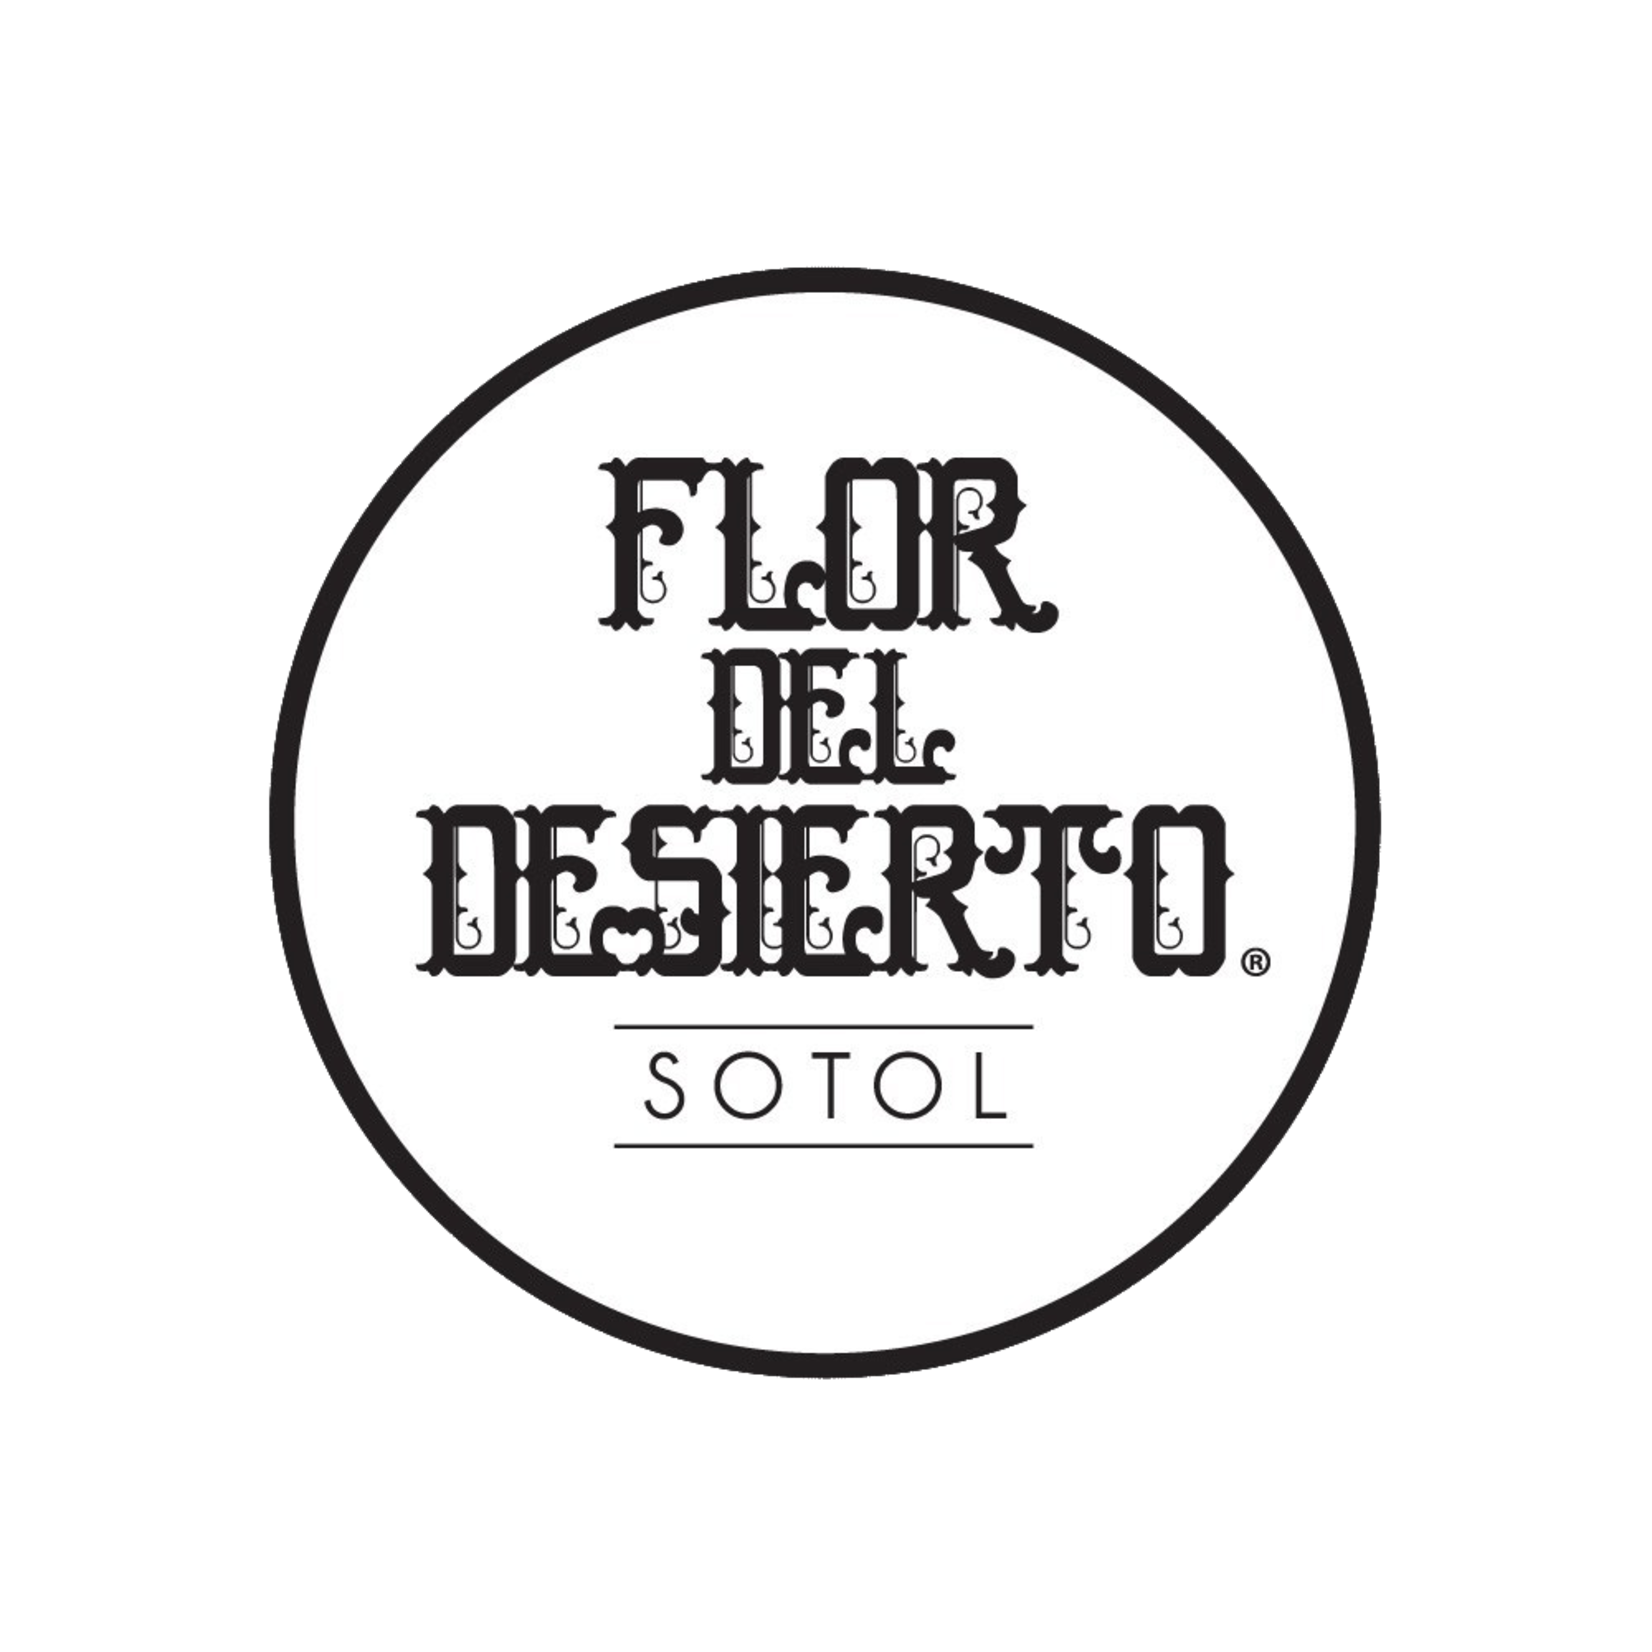 Spirits Flor del Desierto Sotol